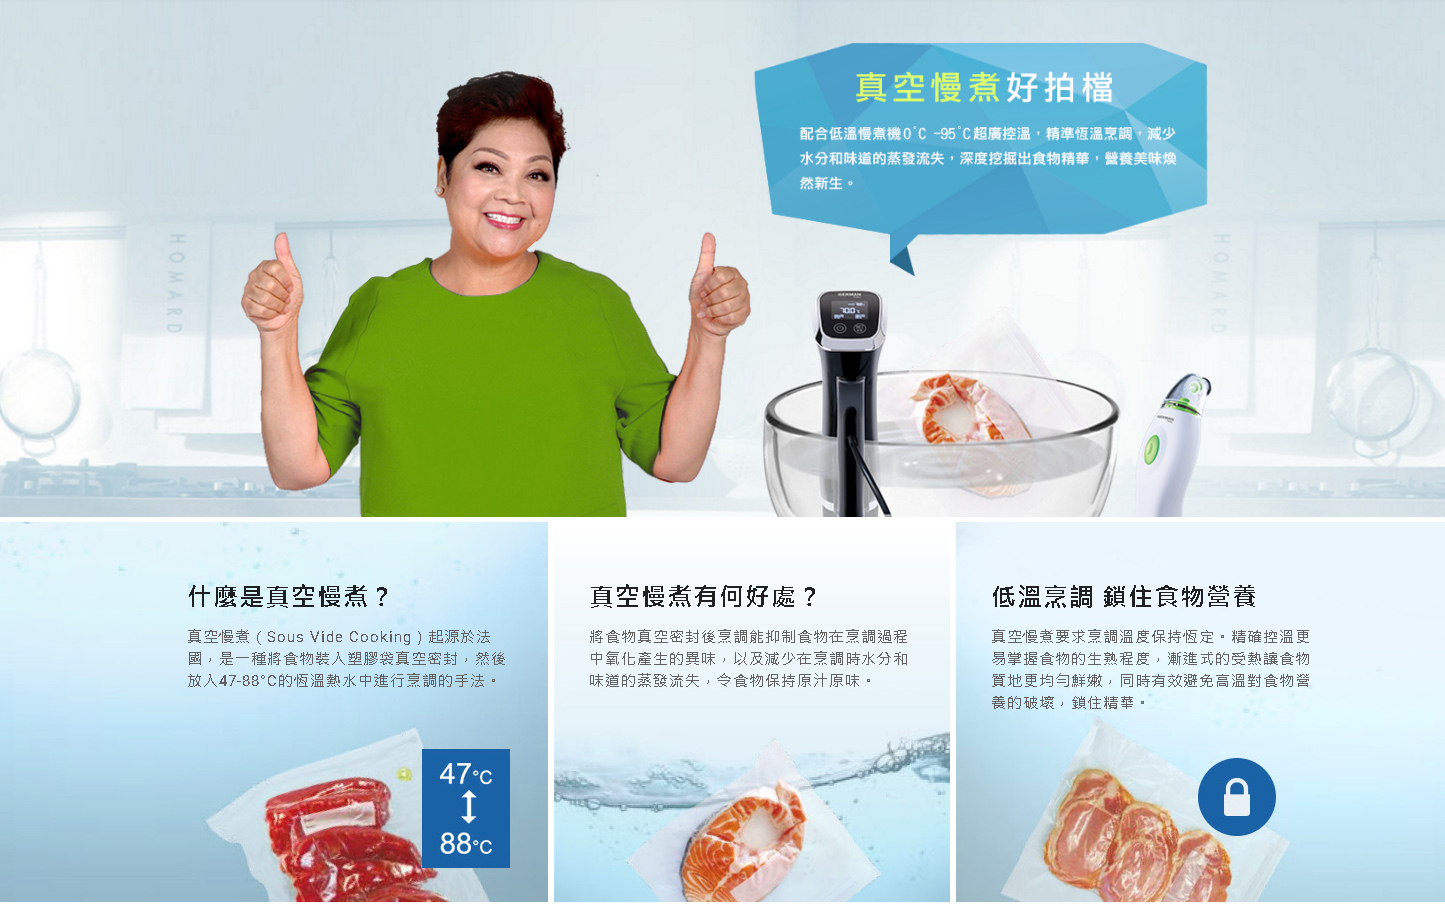 Germanpool 德國寶手提電動抽真空保鮮機 - Outlet Express HK生活百貨城